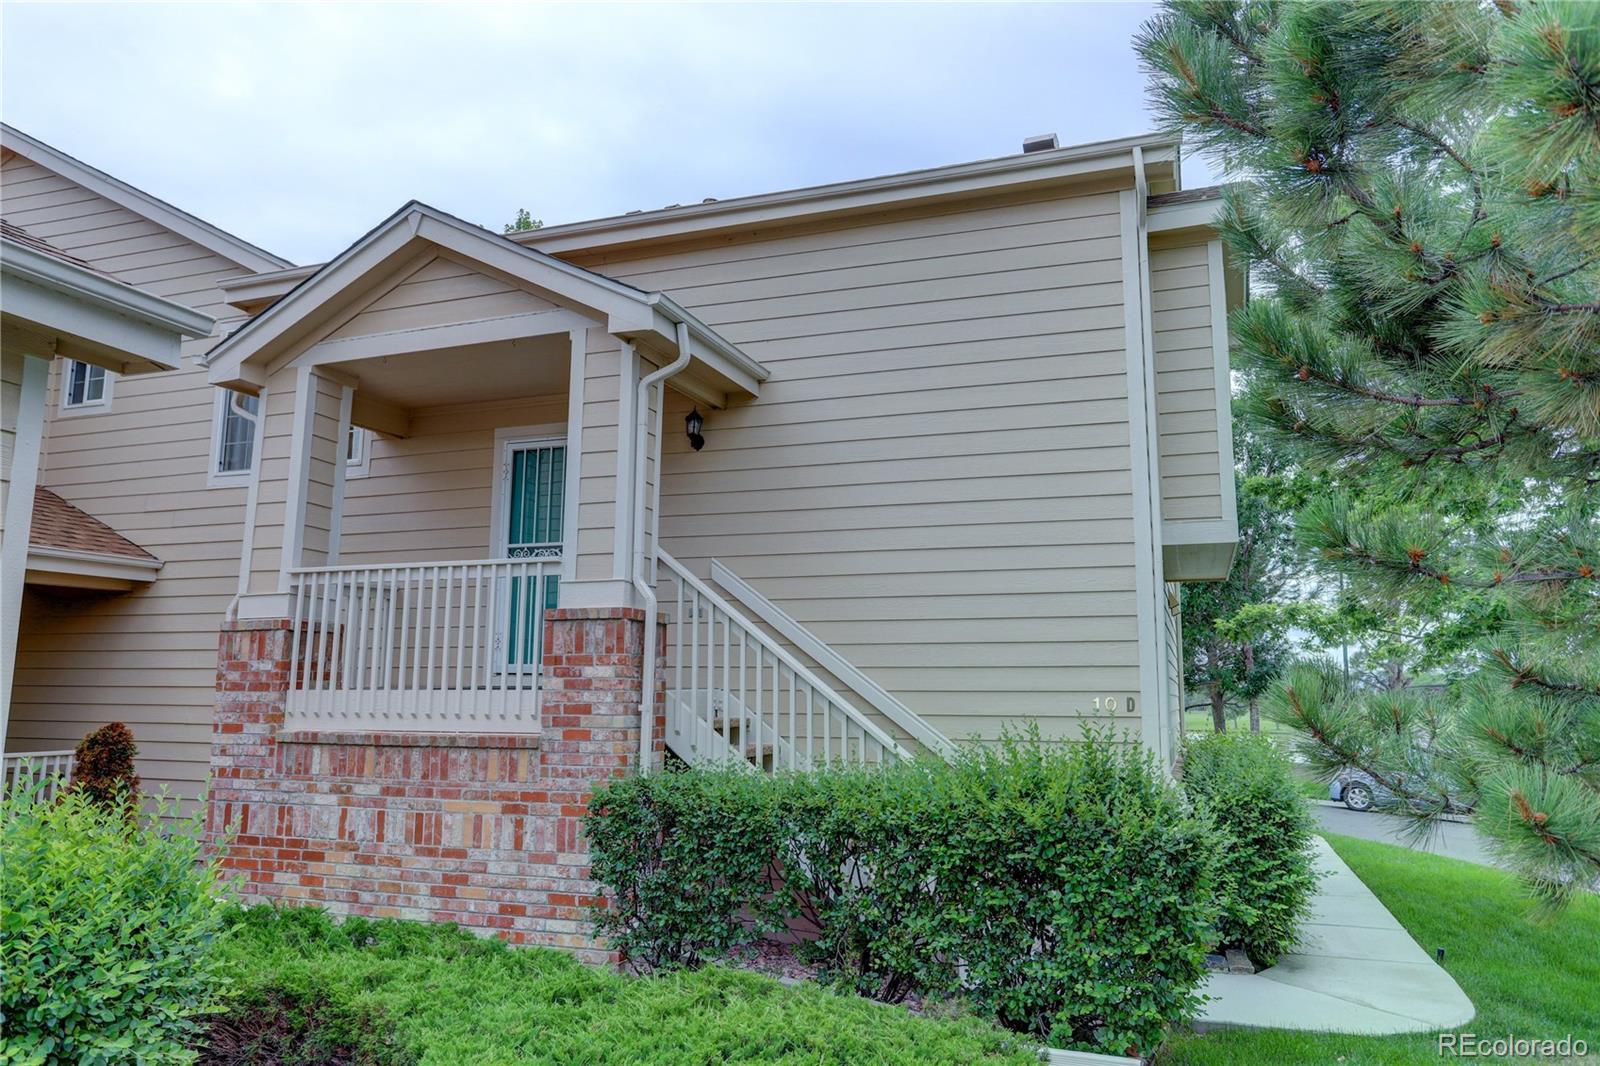 MLS# 2836182 - 1 - 7700 W Grant Ranch Boulevard #10D, Littleton, CO 80123